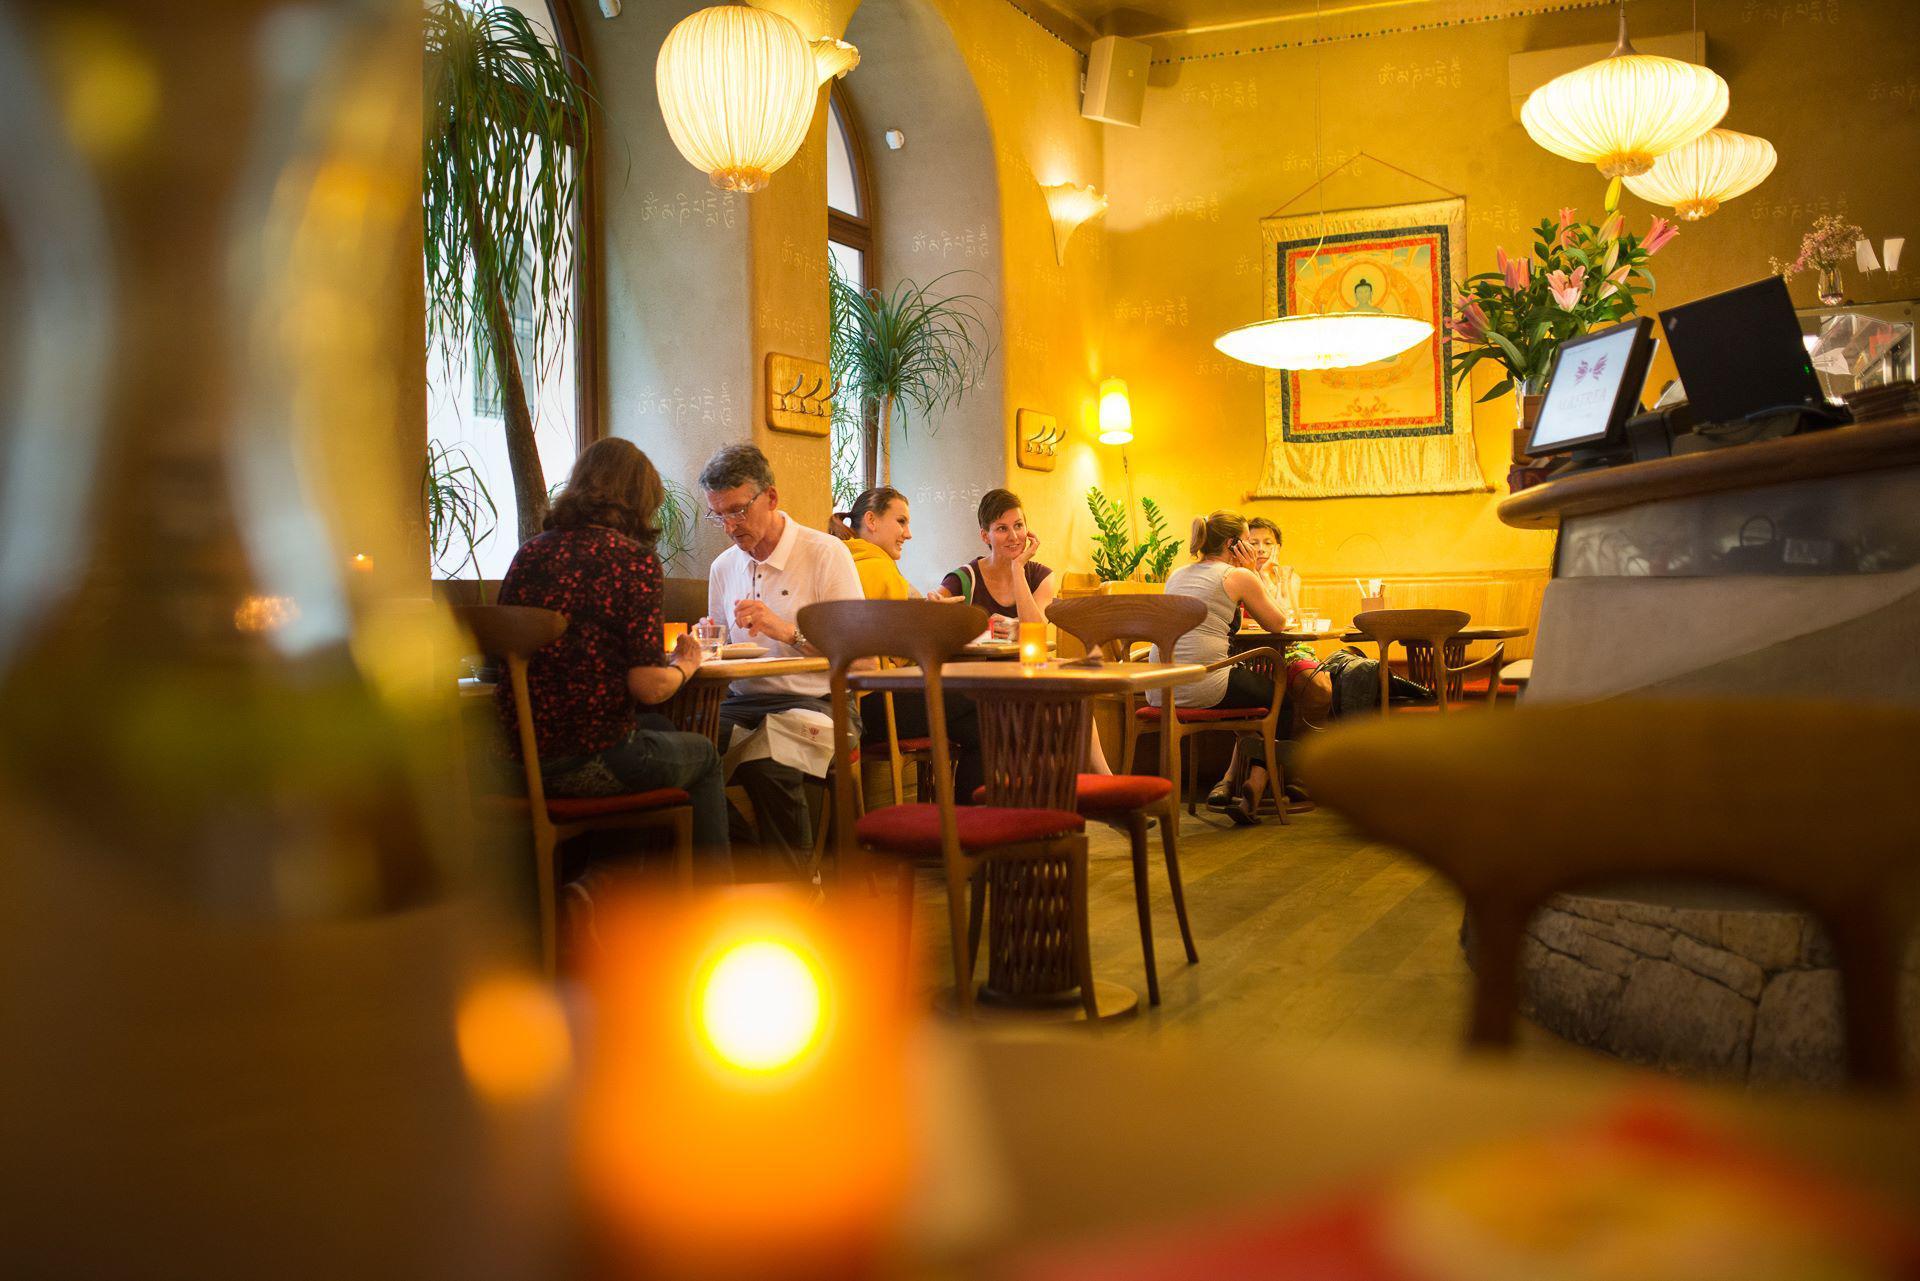 Restaurace Maitrea - vegetariánská restaurace